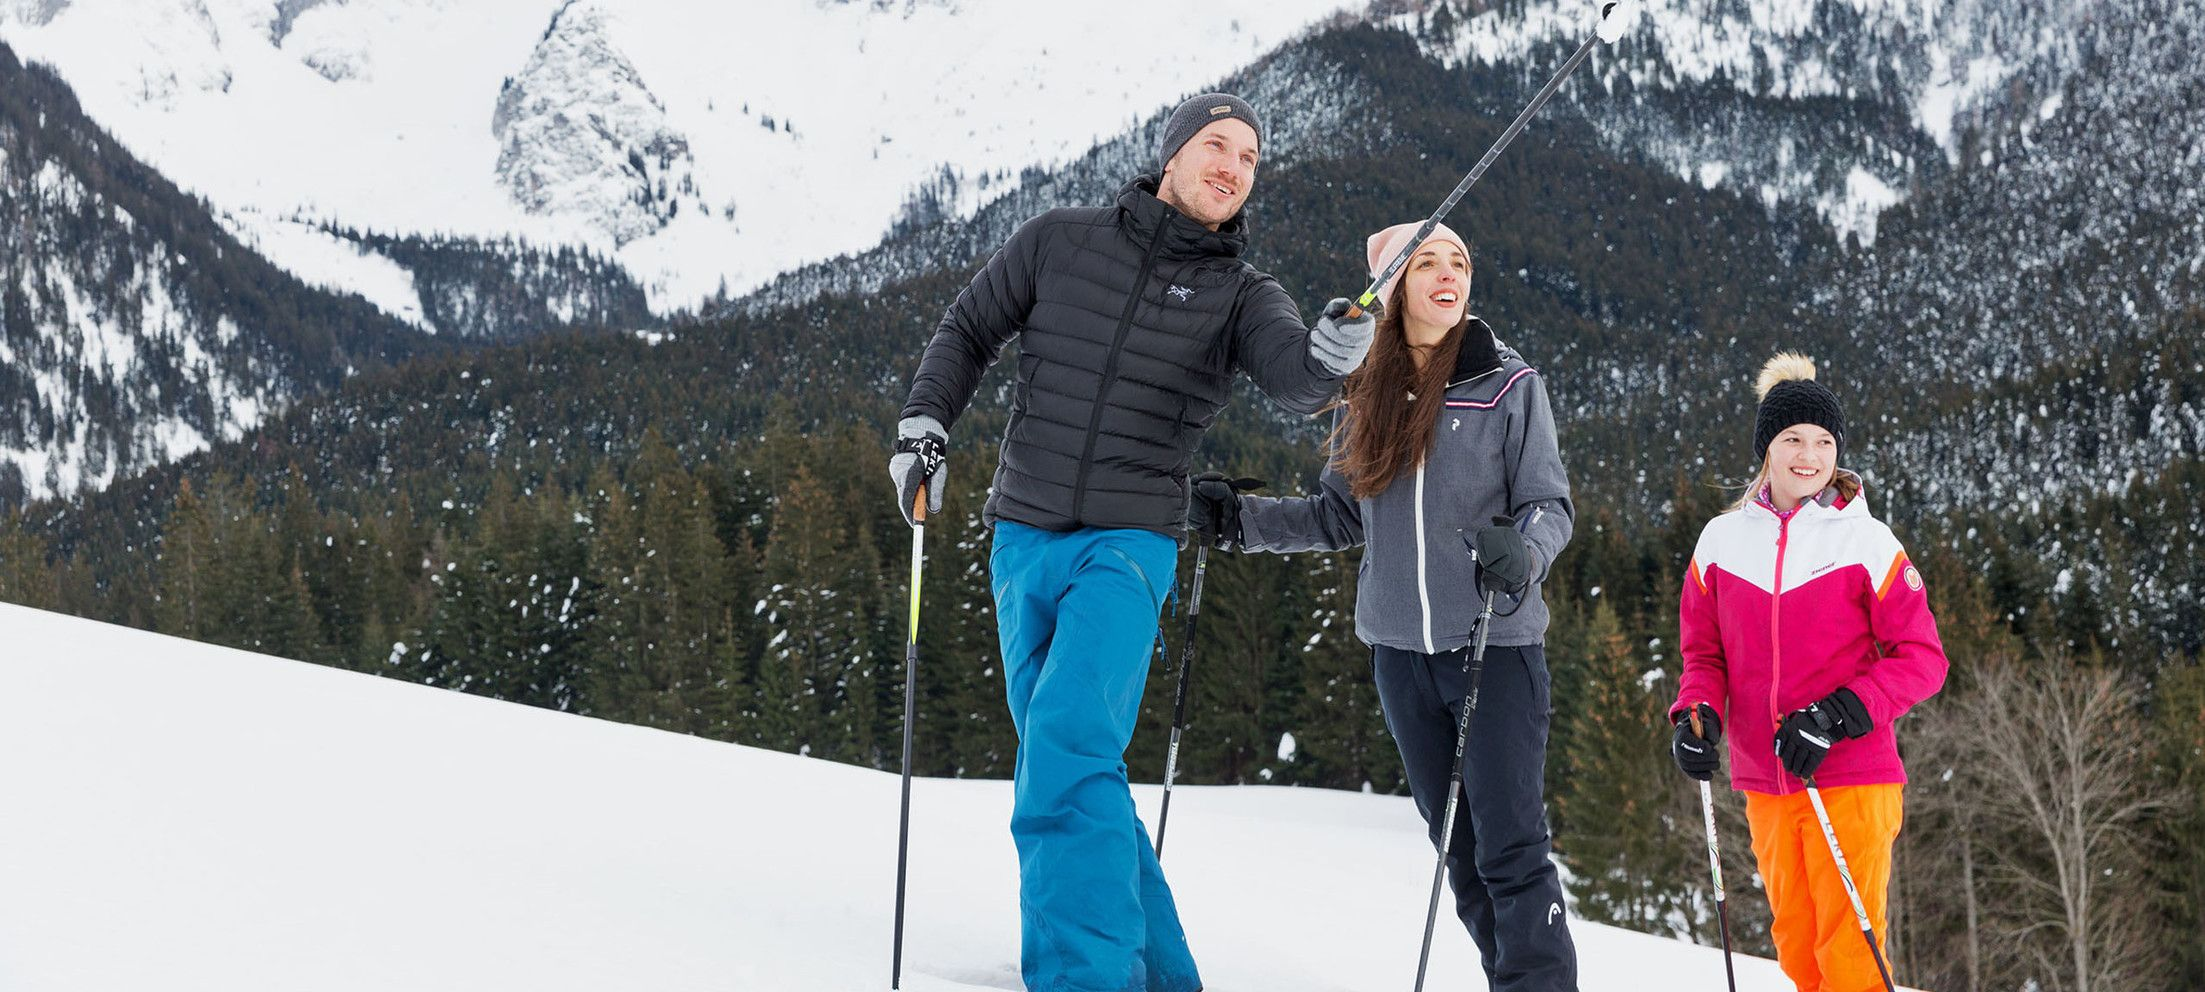 Touren-Ski gehen im Lammertal